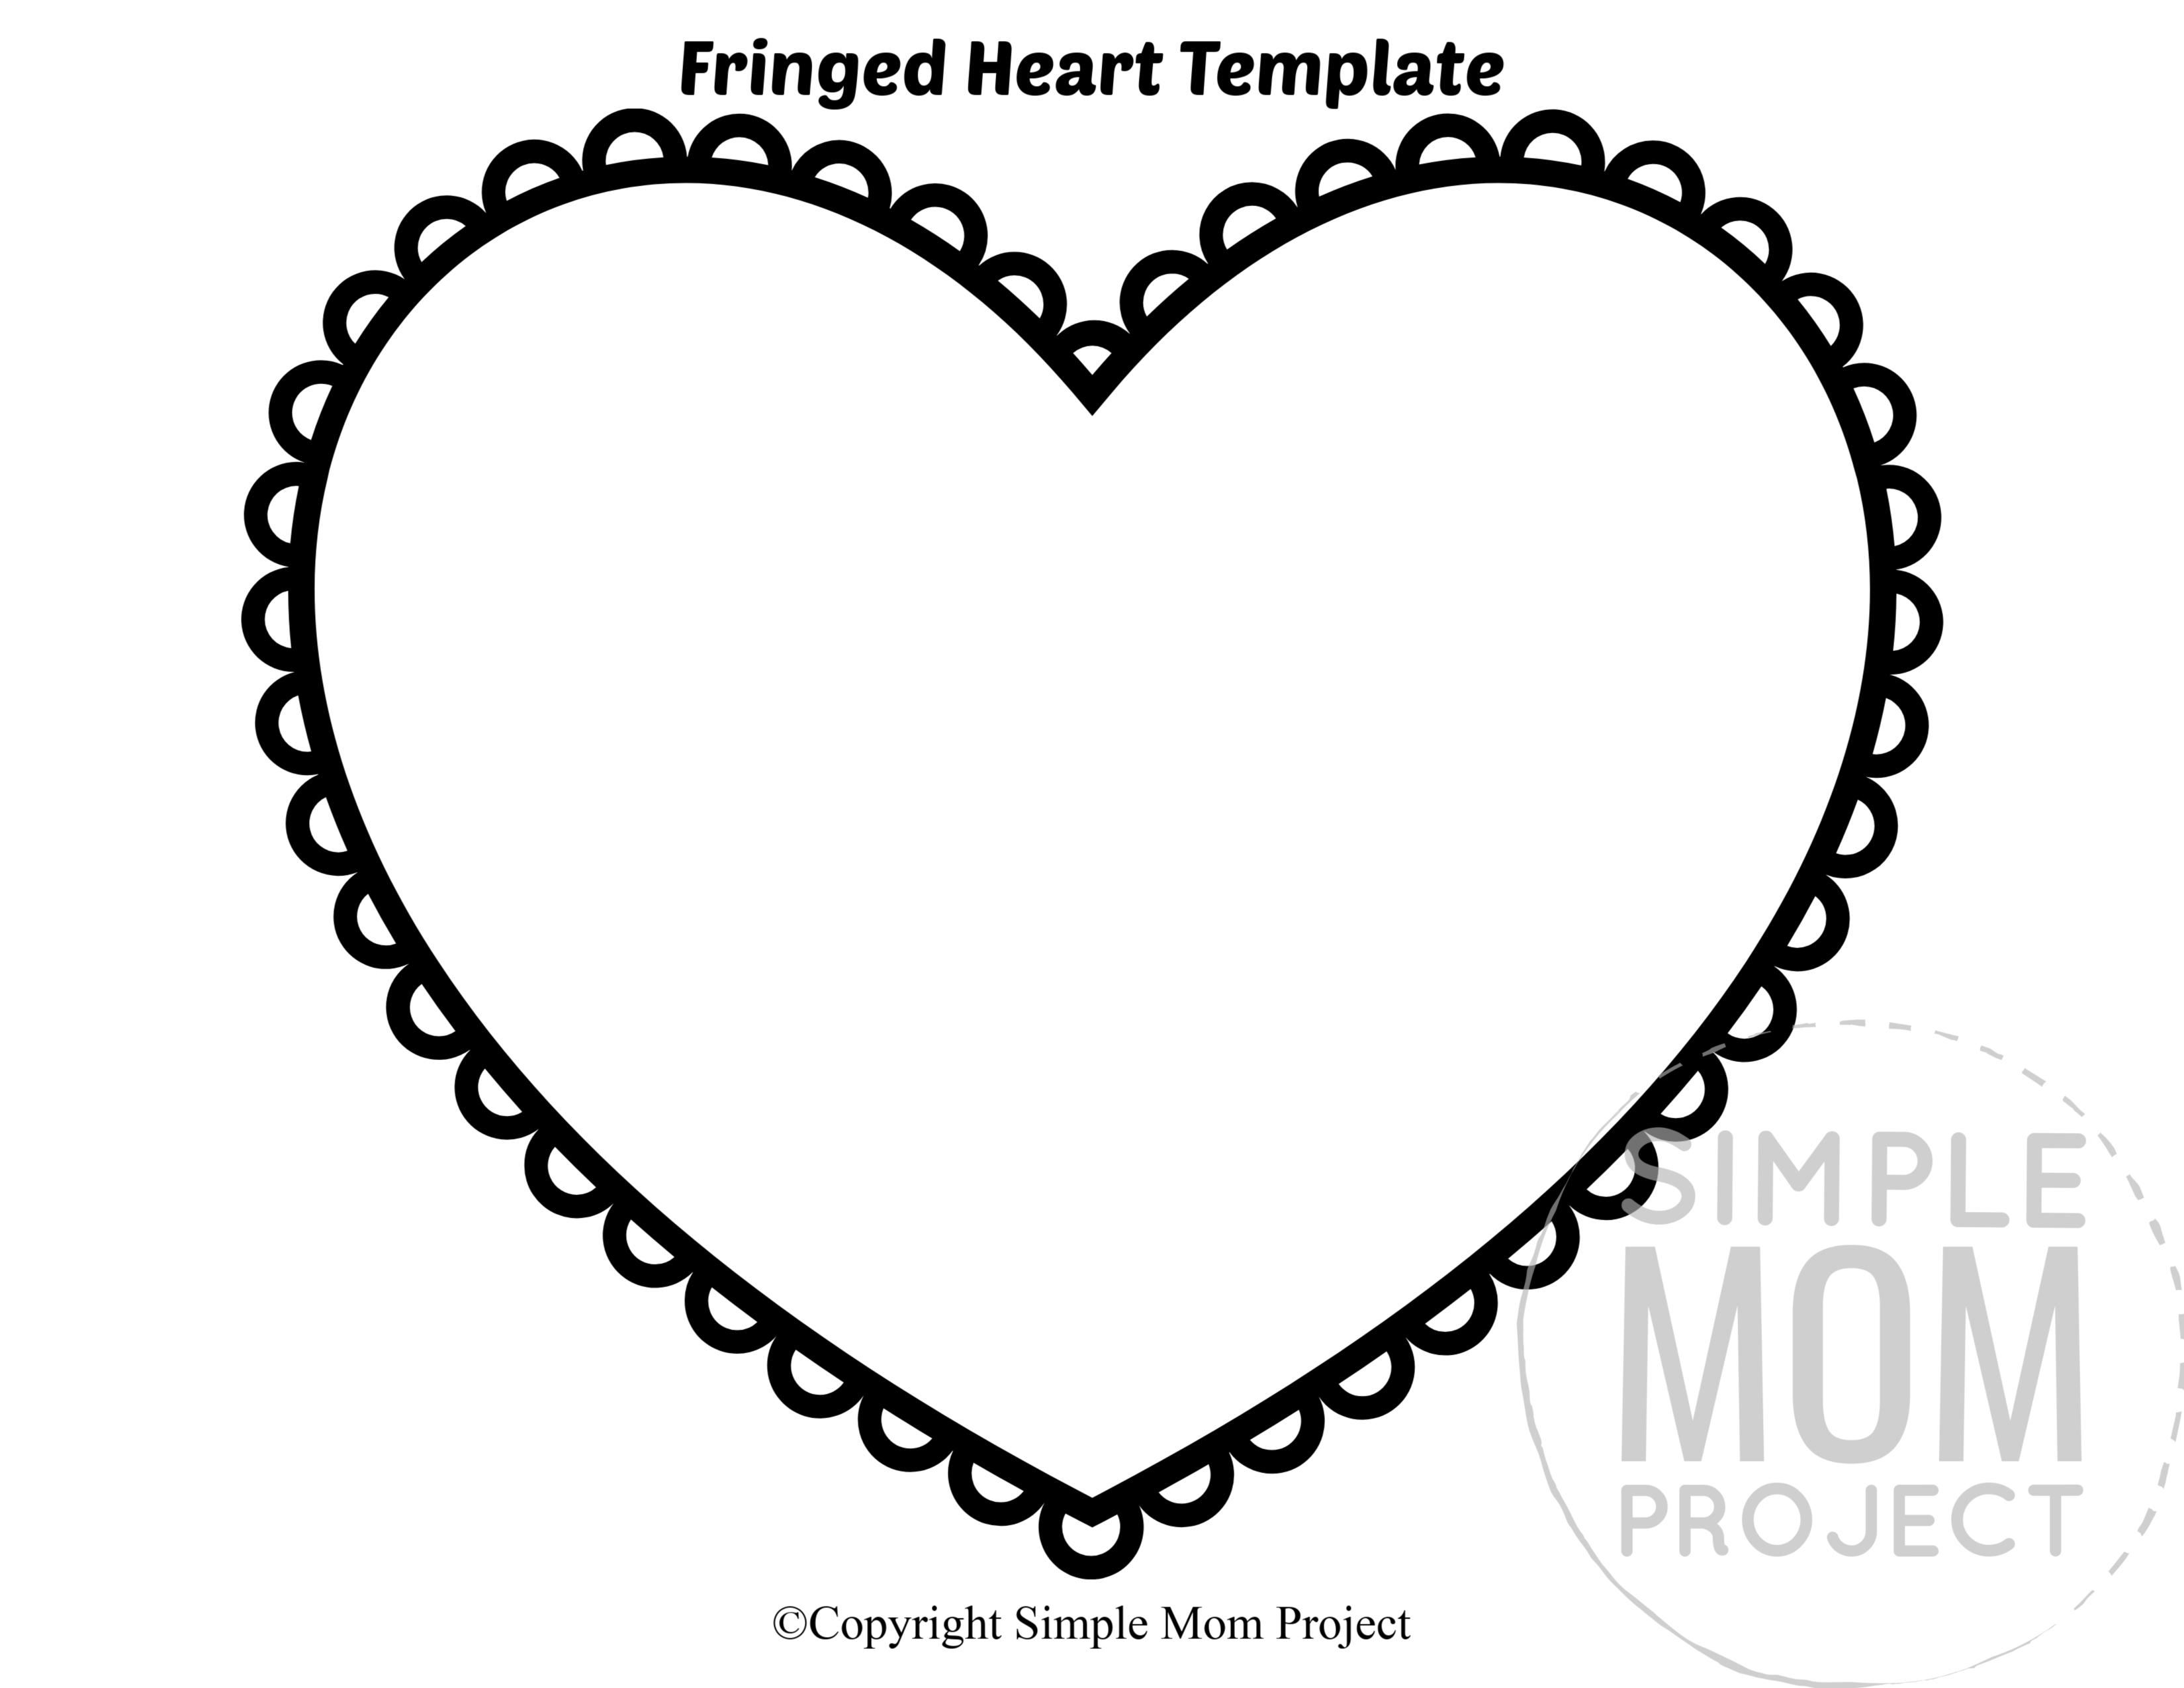 Free Printable Large Heart Shape Templates Heart Shapes Template Heart Template Printable Heart Template